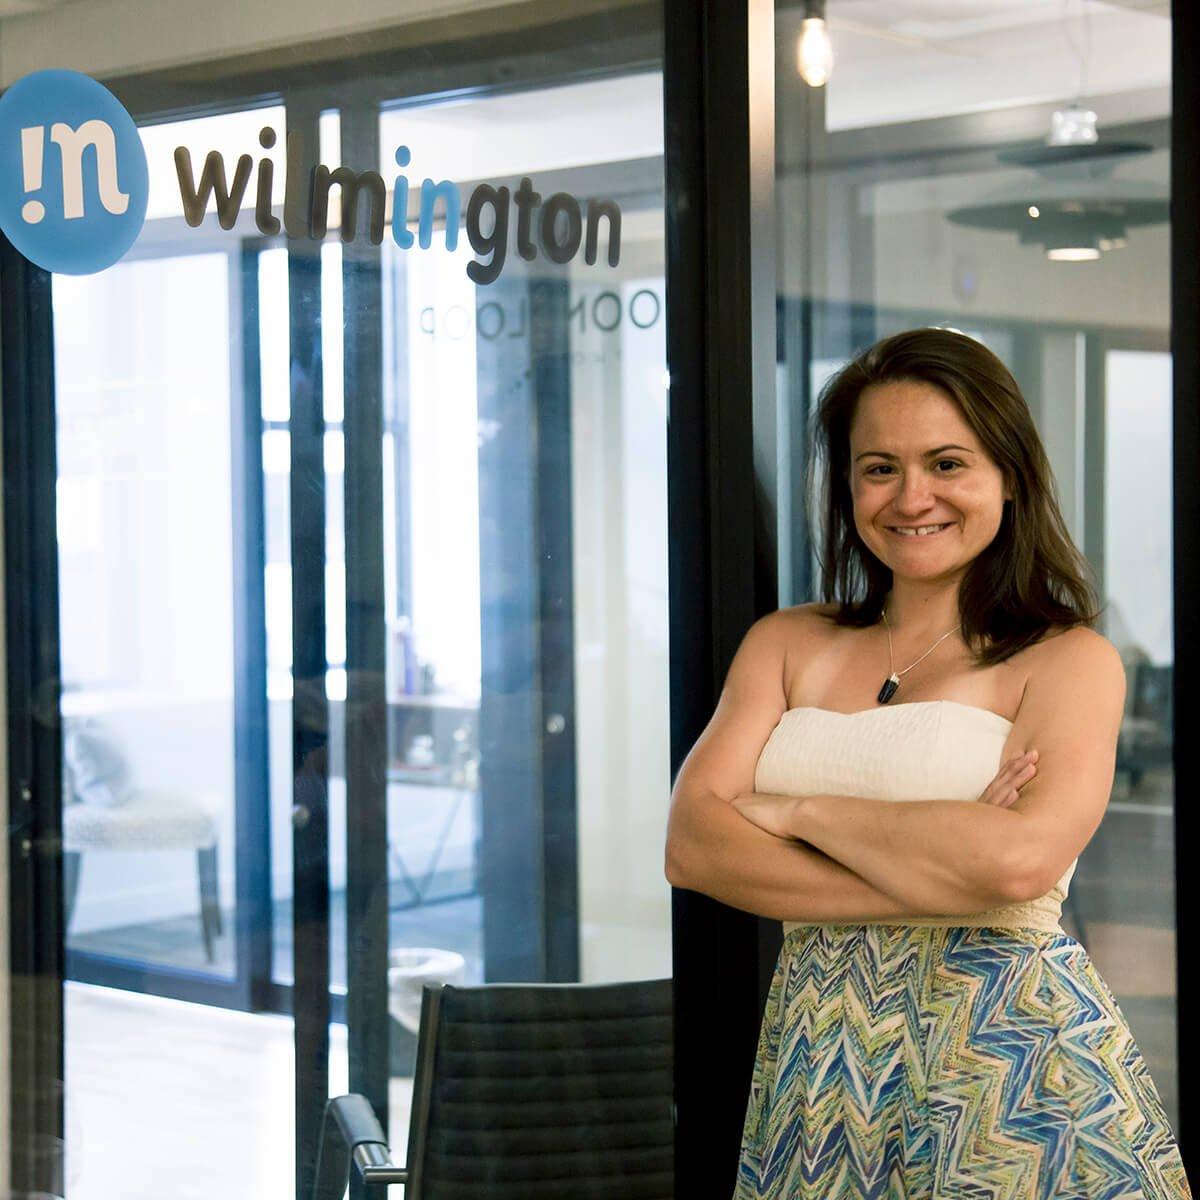 The Mill member, Brianna Hansen of InWilmington